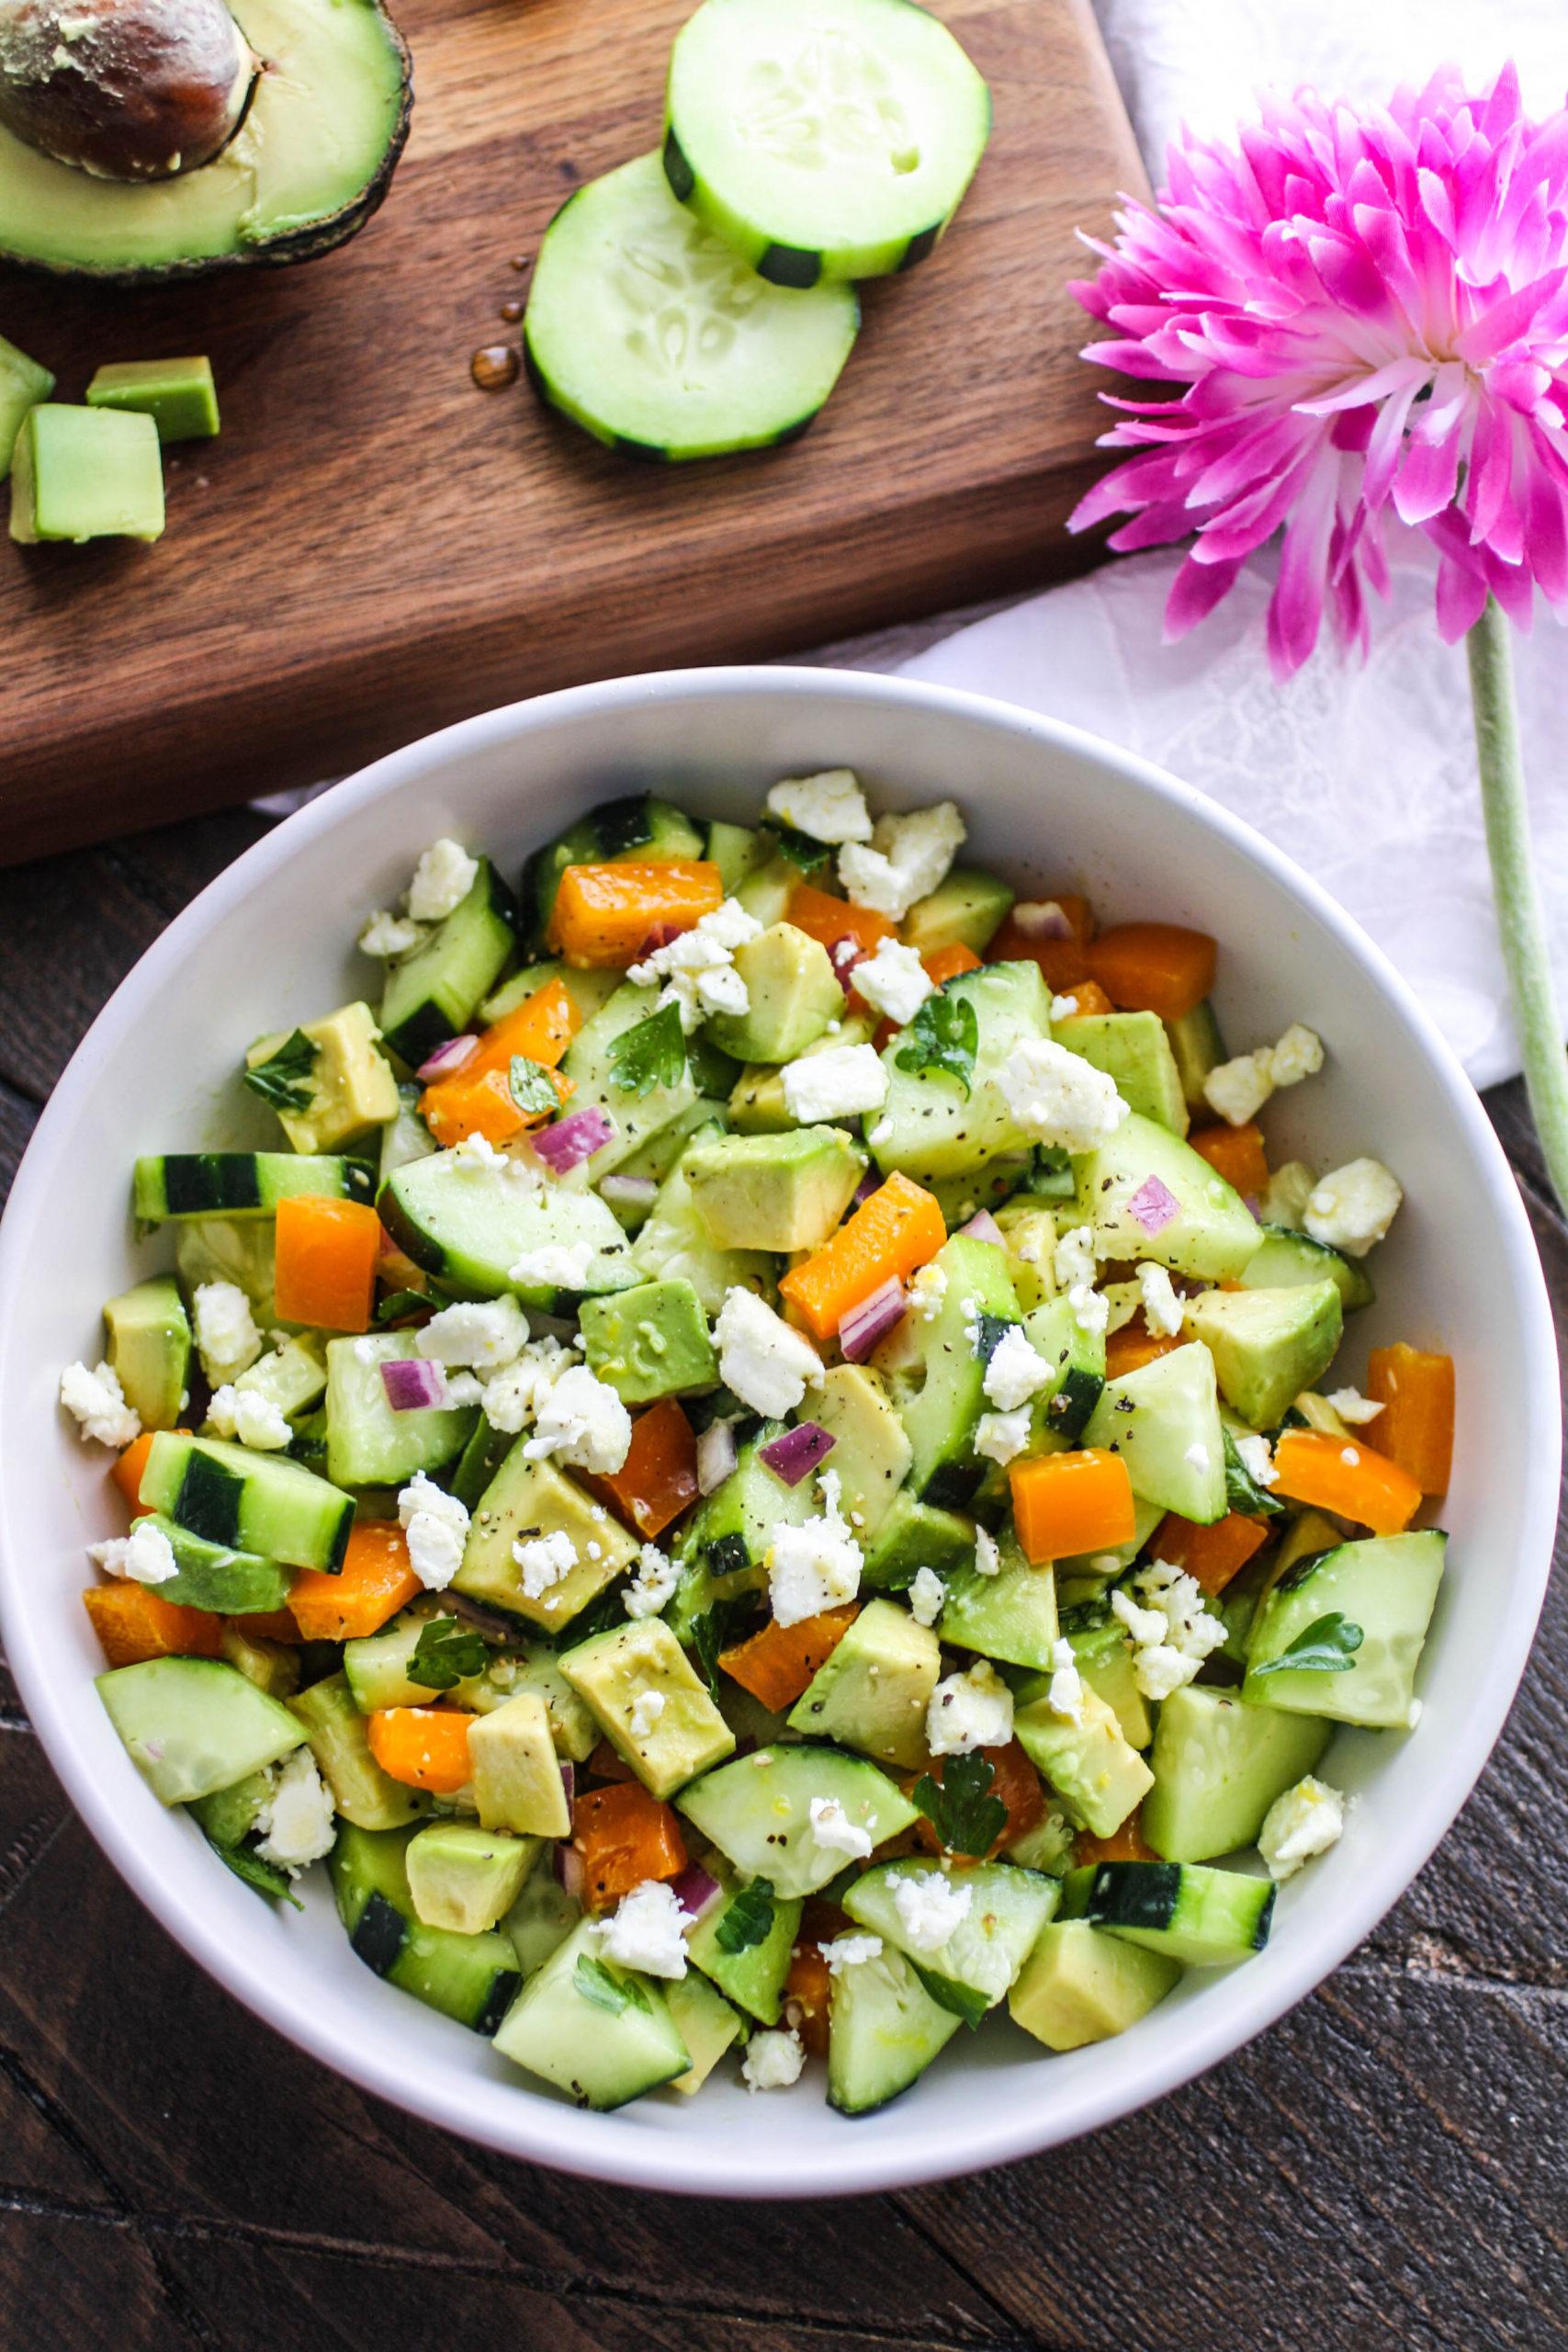 Enjoy a big plate of Cucumber-Avocado Salad with Honey-Lemon Vinaigrette.